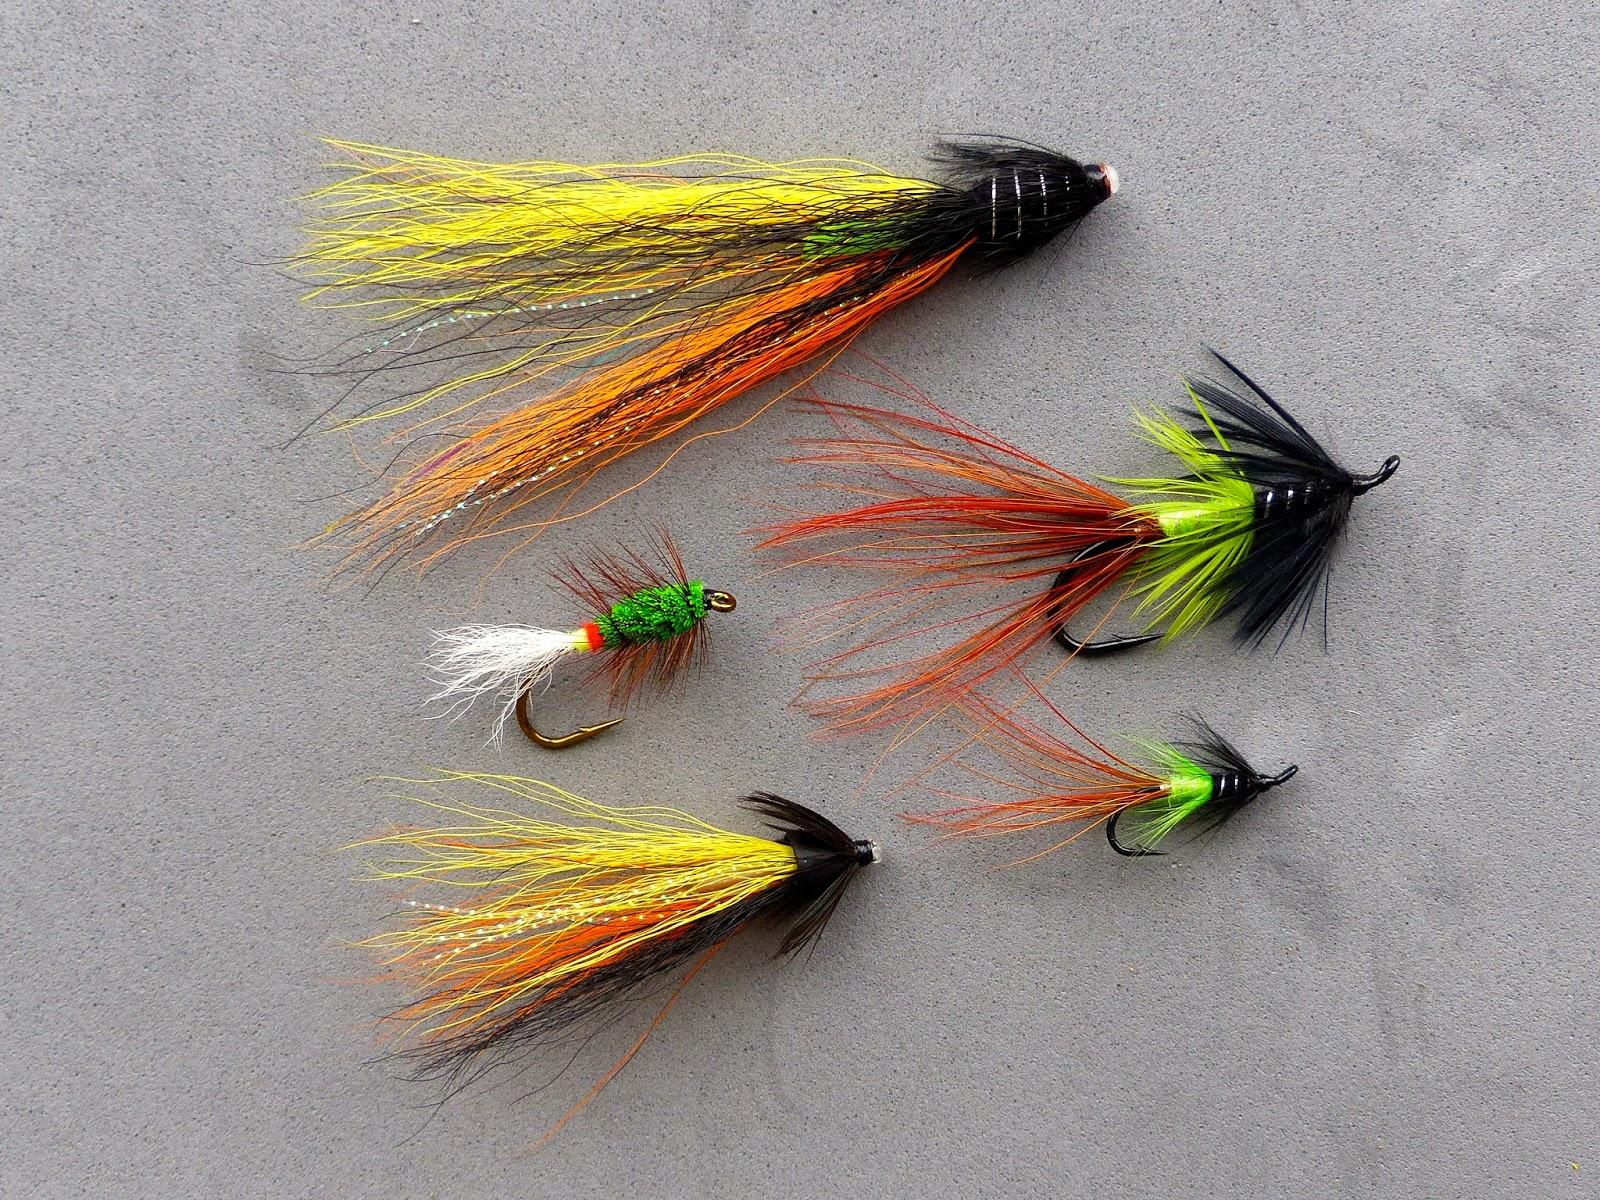 Atlantic salmon flies naugatuck river fall 2014 top for Salon fly